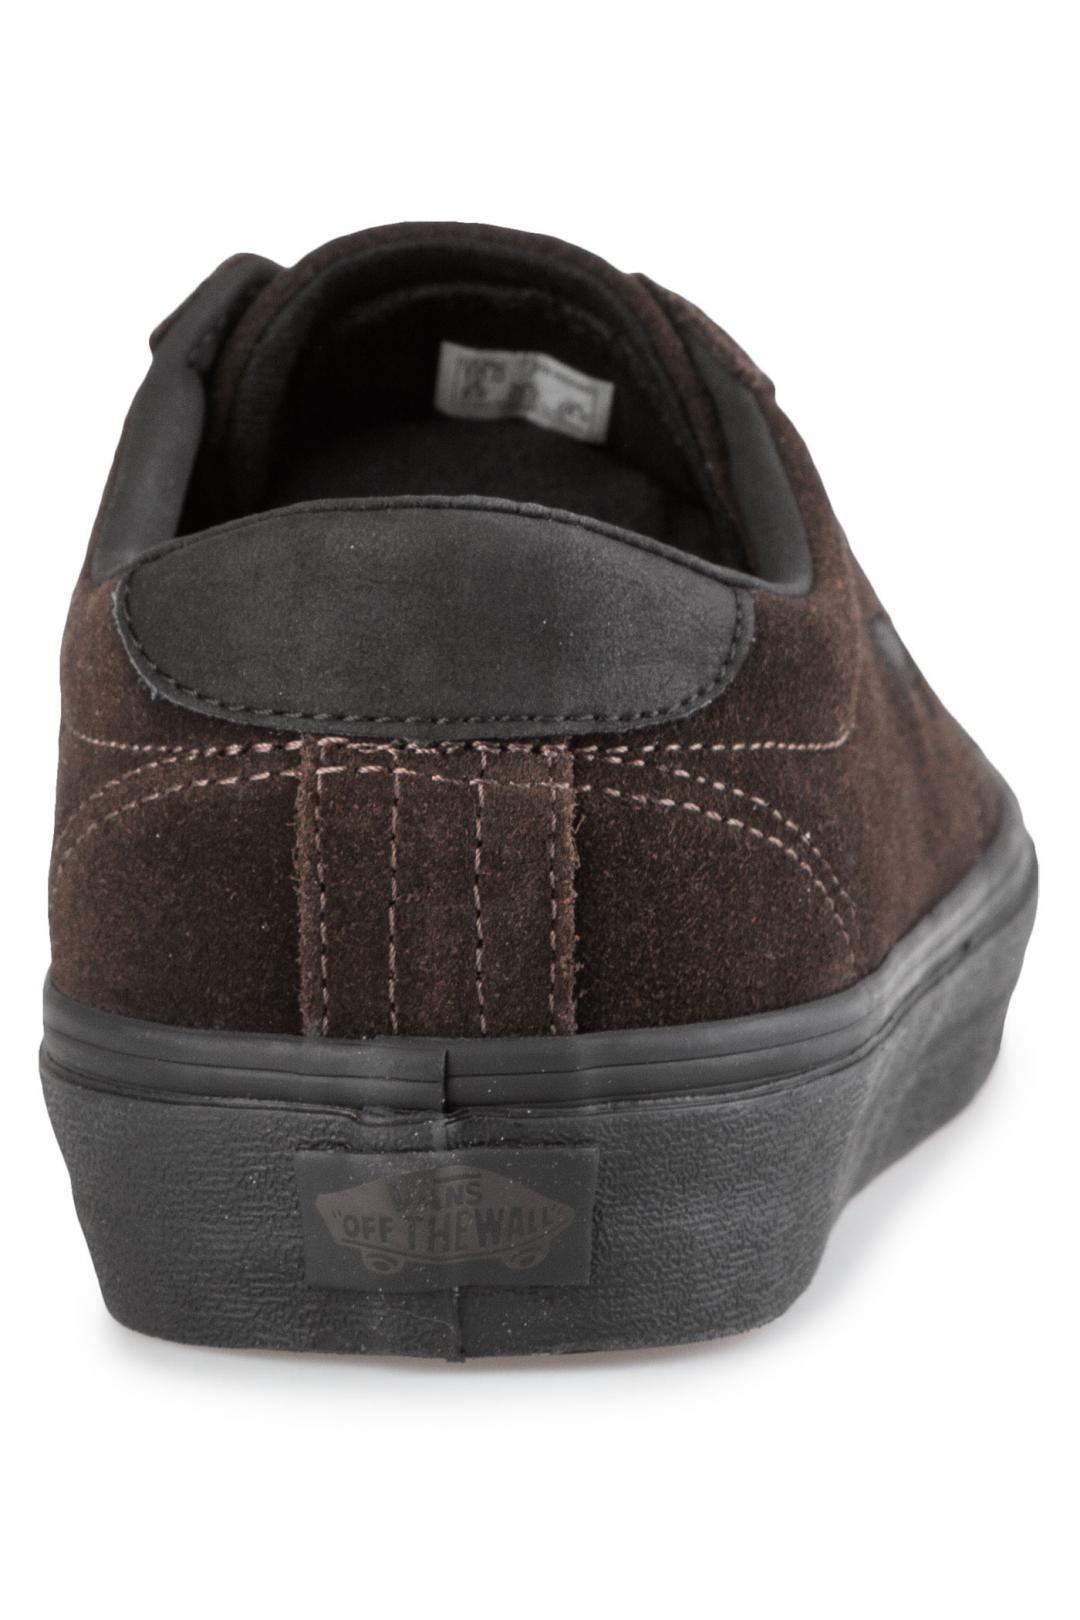 Uomo Vans Court Icon demitasse black | Scarpe da skate